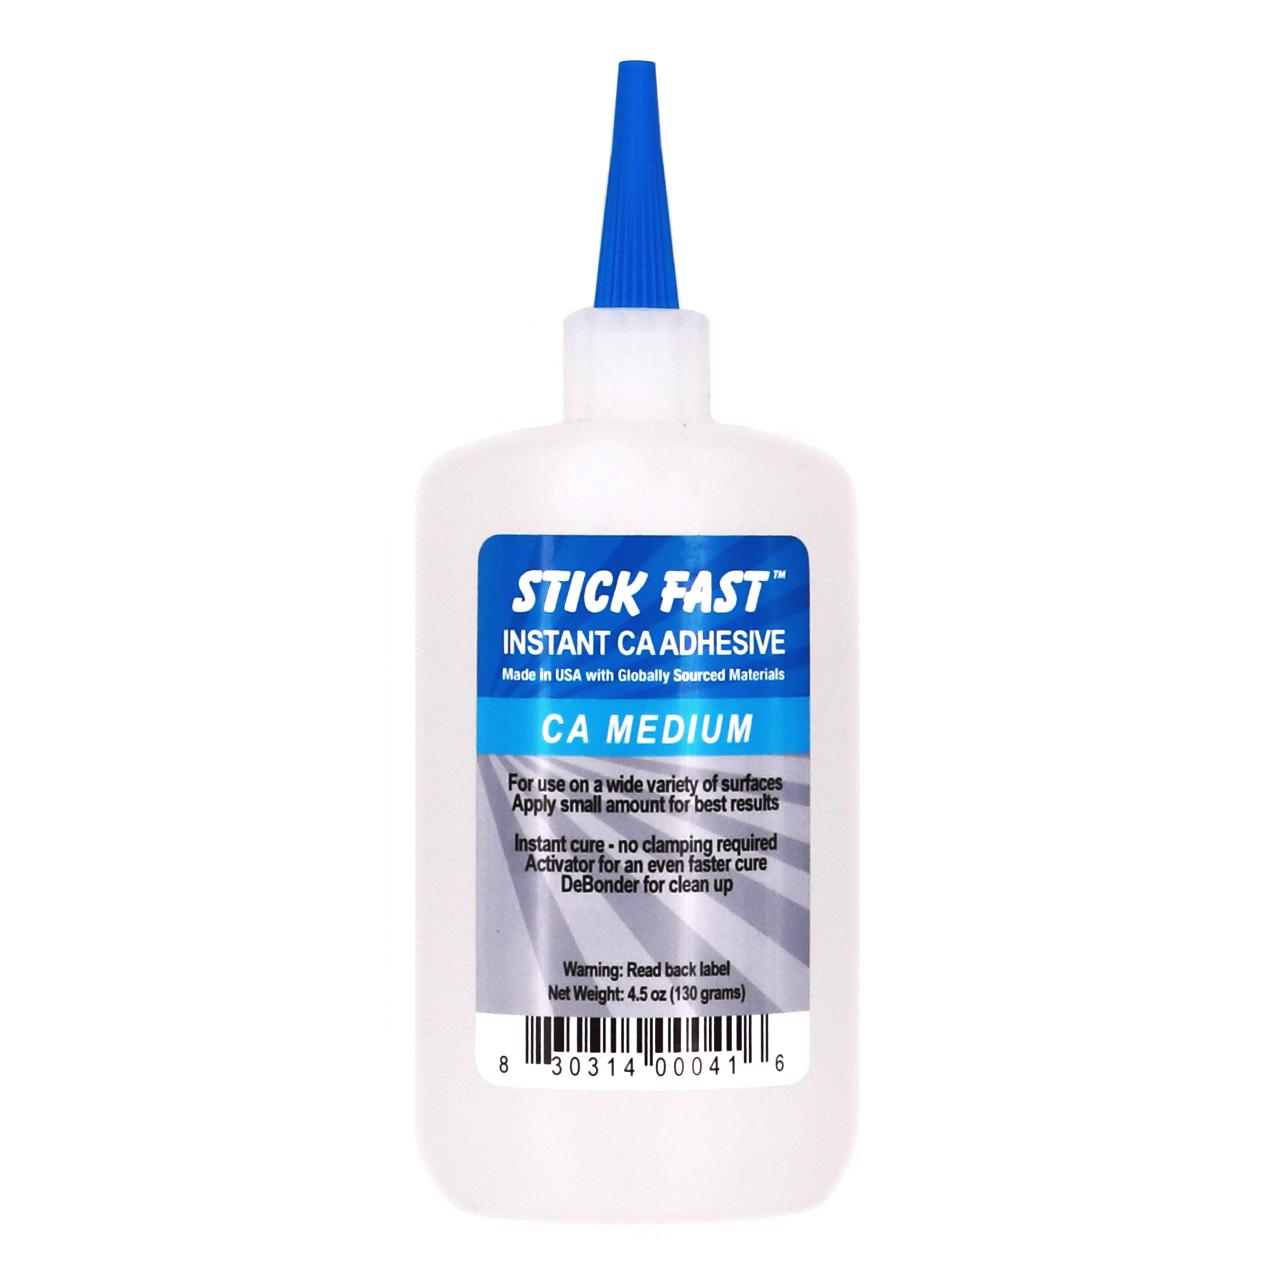 Stick Fast Instant CA Adhesive Glue, Medium Viscosity, 4.5oz Bottle